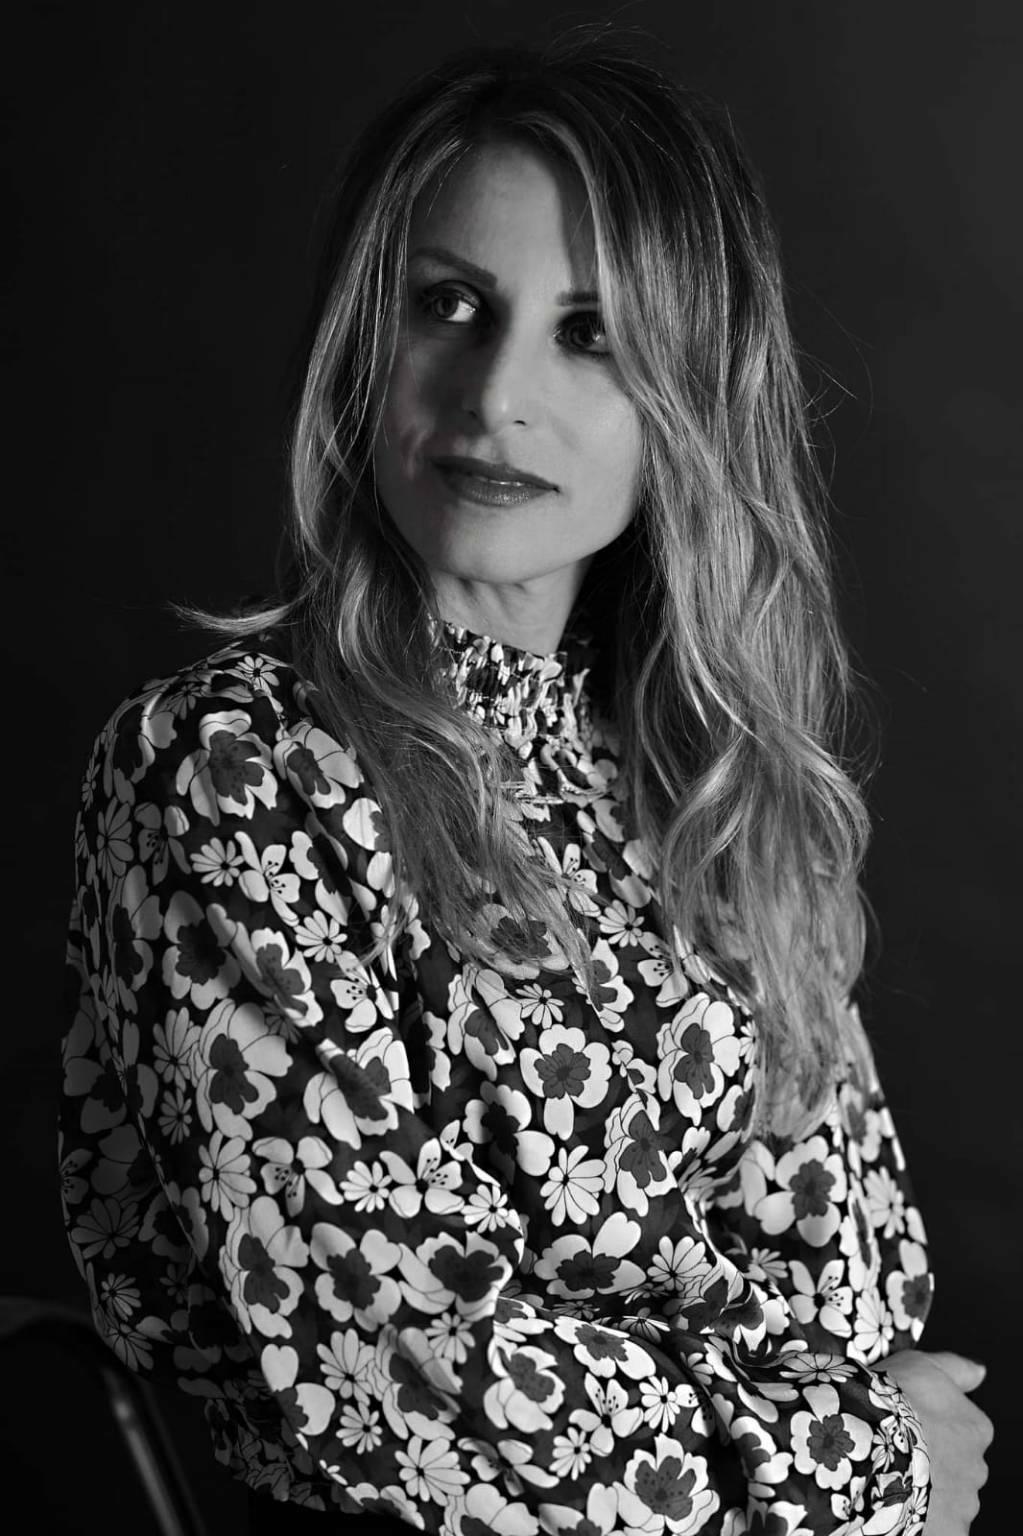 Alessandra Aceto